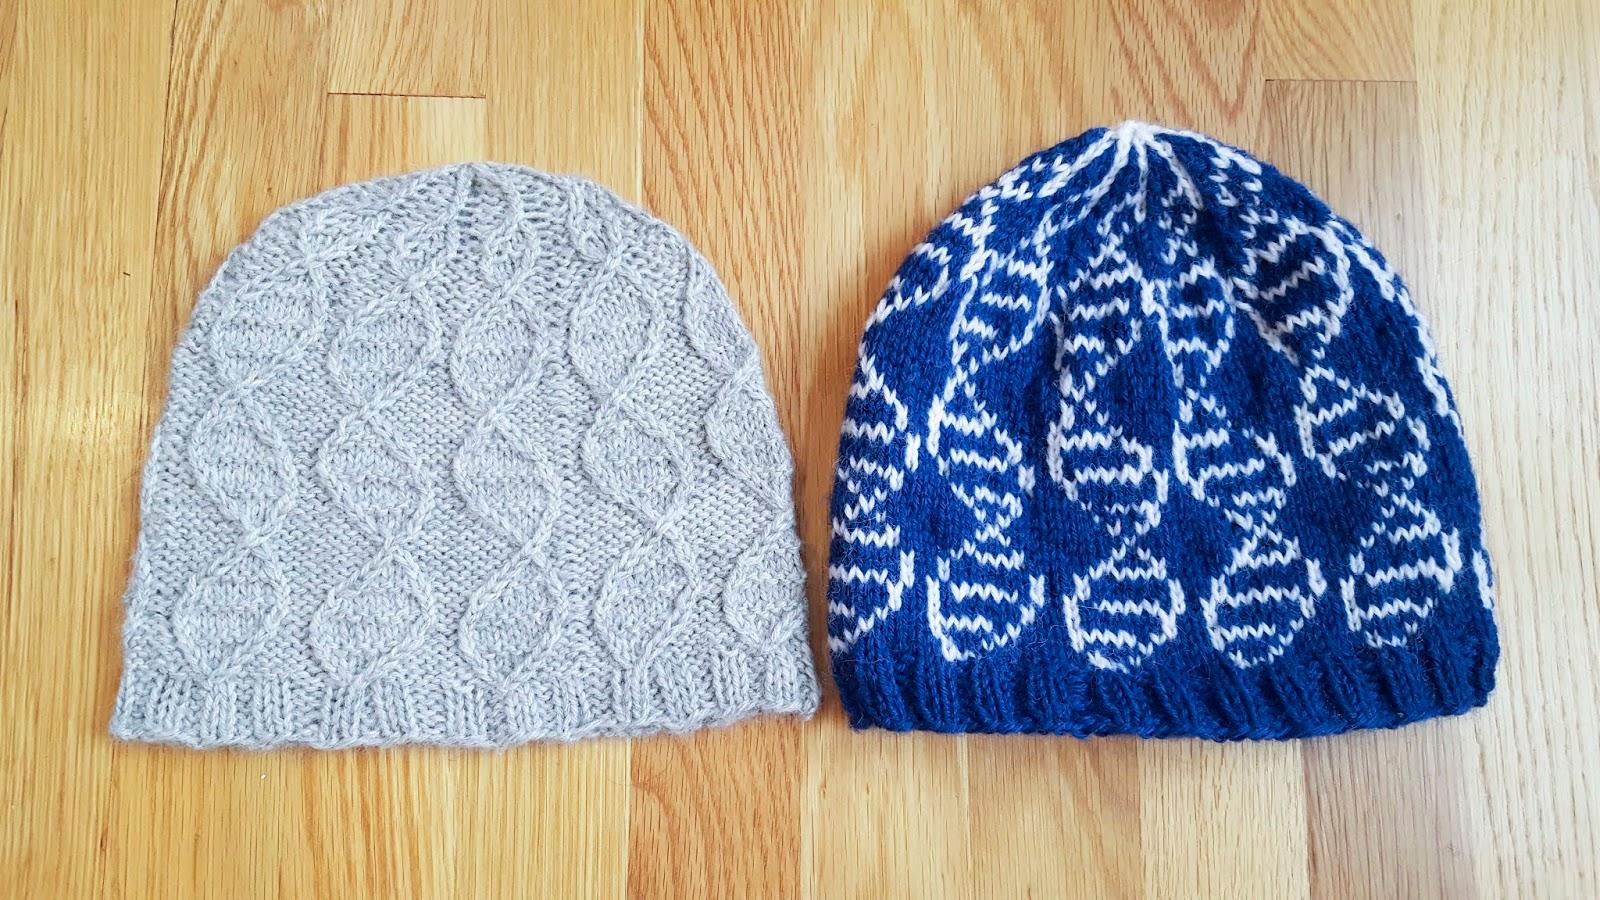 ChemKnits: GENEie Knitting Pattern - Colorwork Version